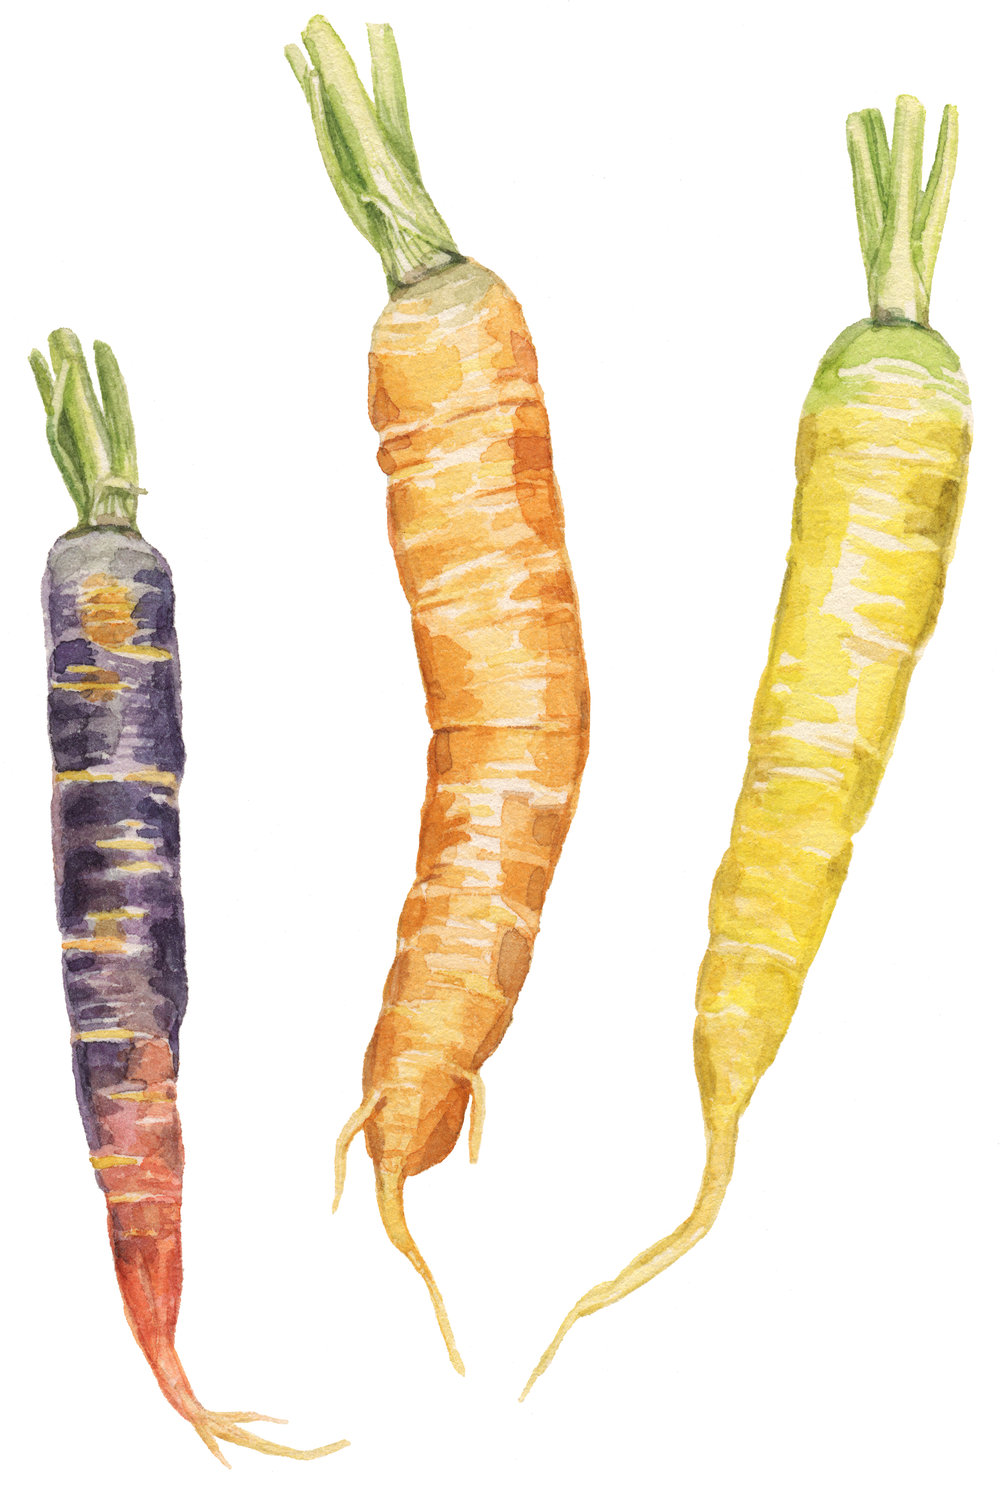 27-late-carrots-lrg.jpg